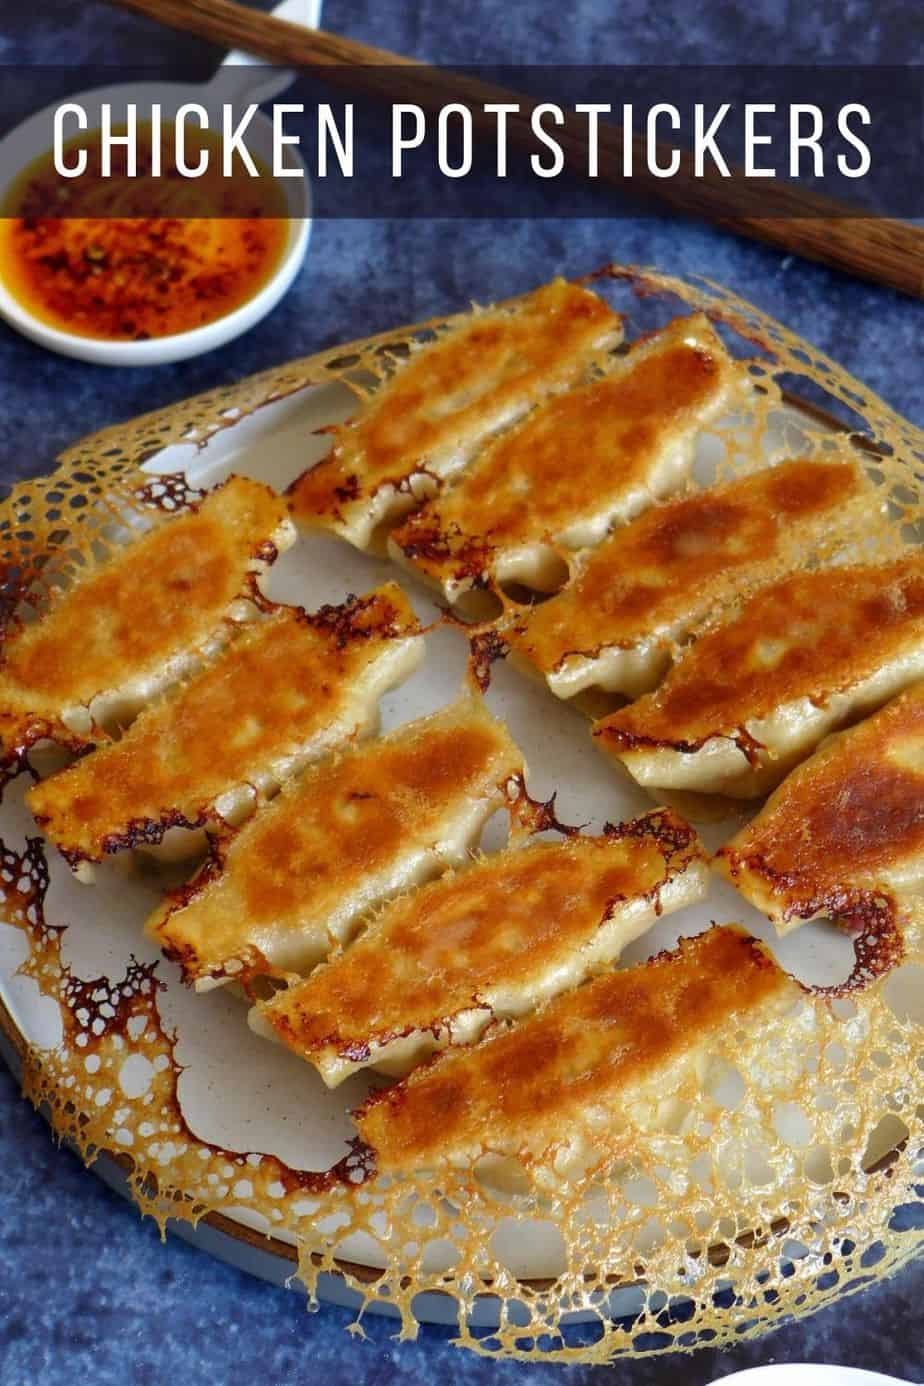 pan-fried potstickers with golden crust